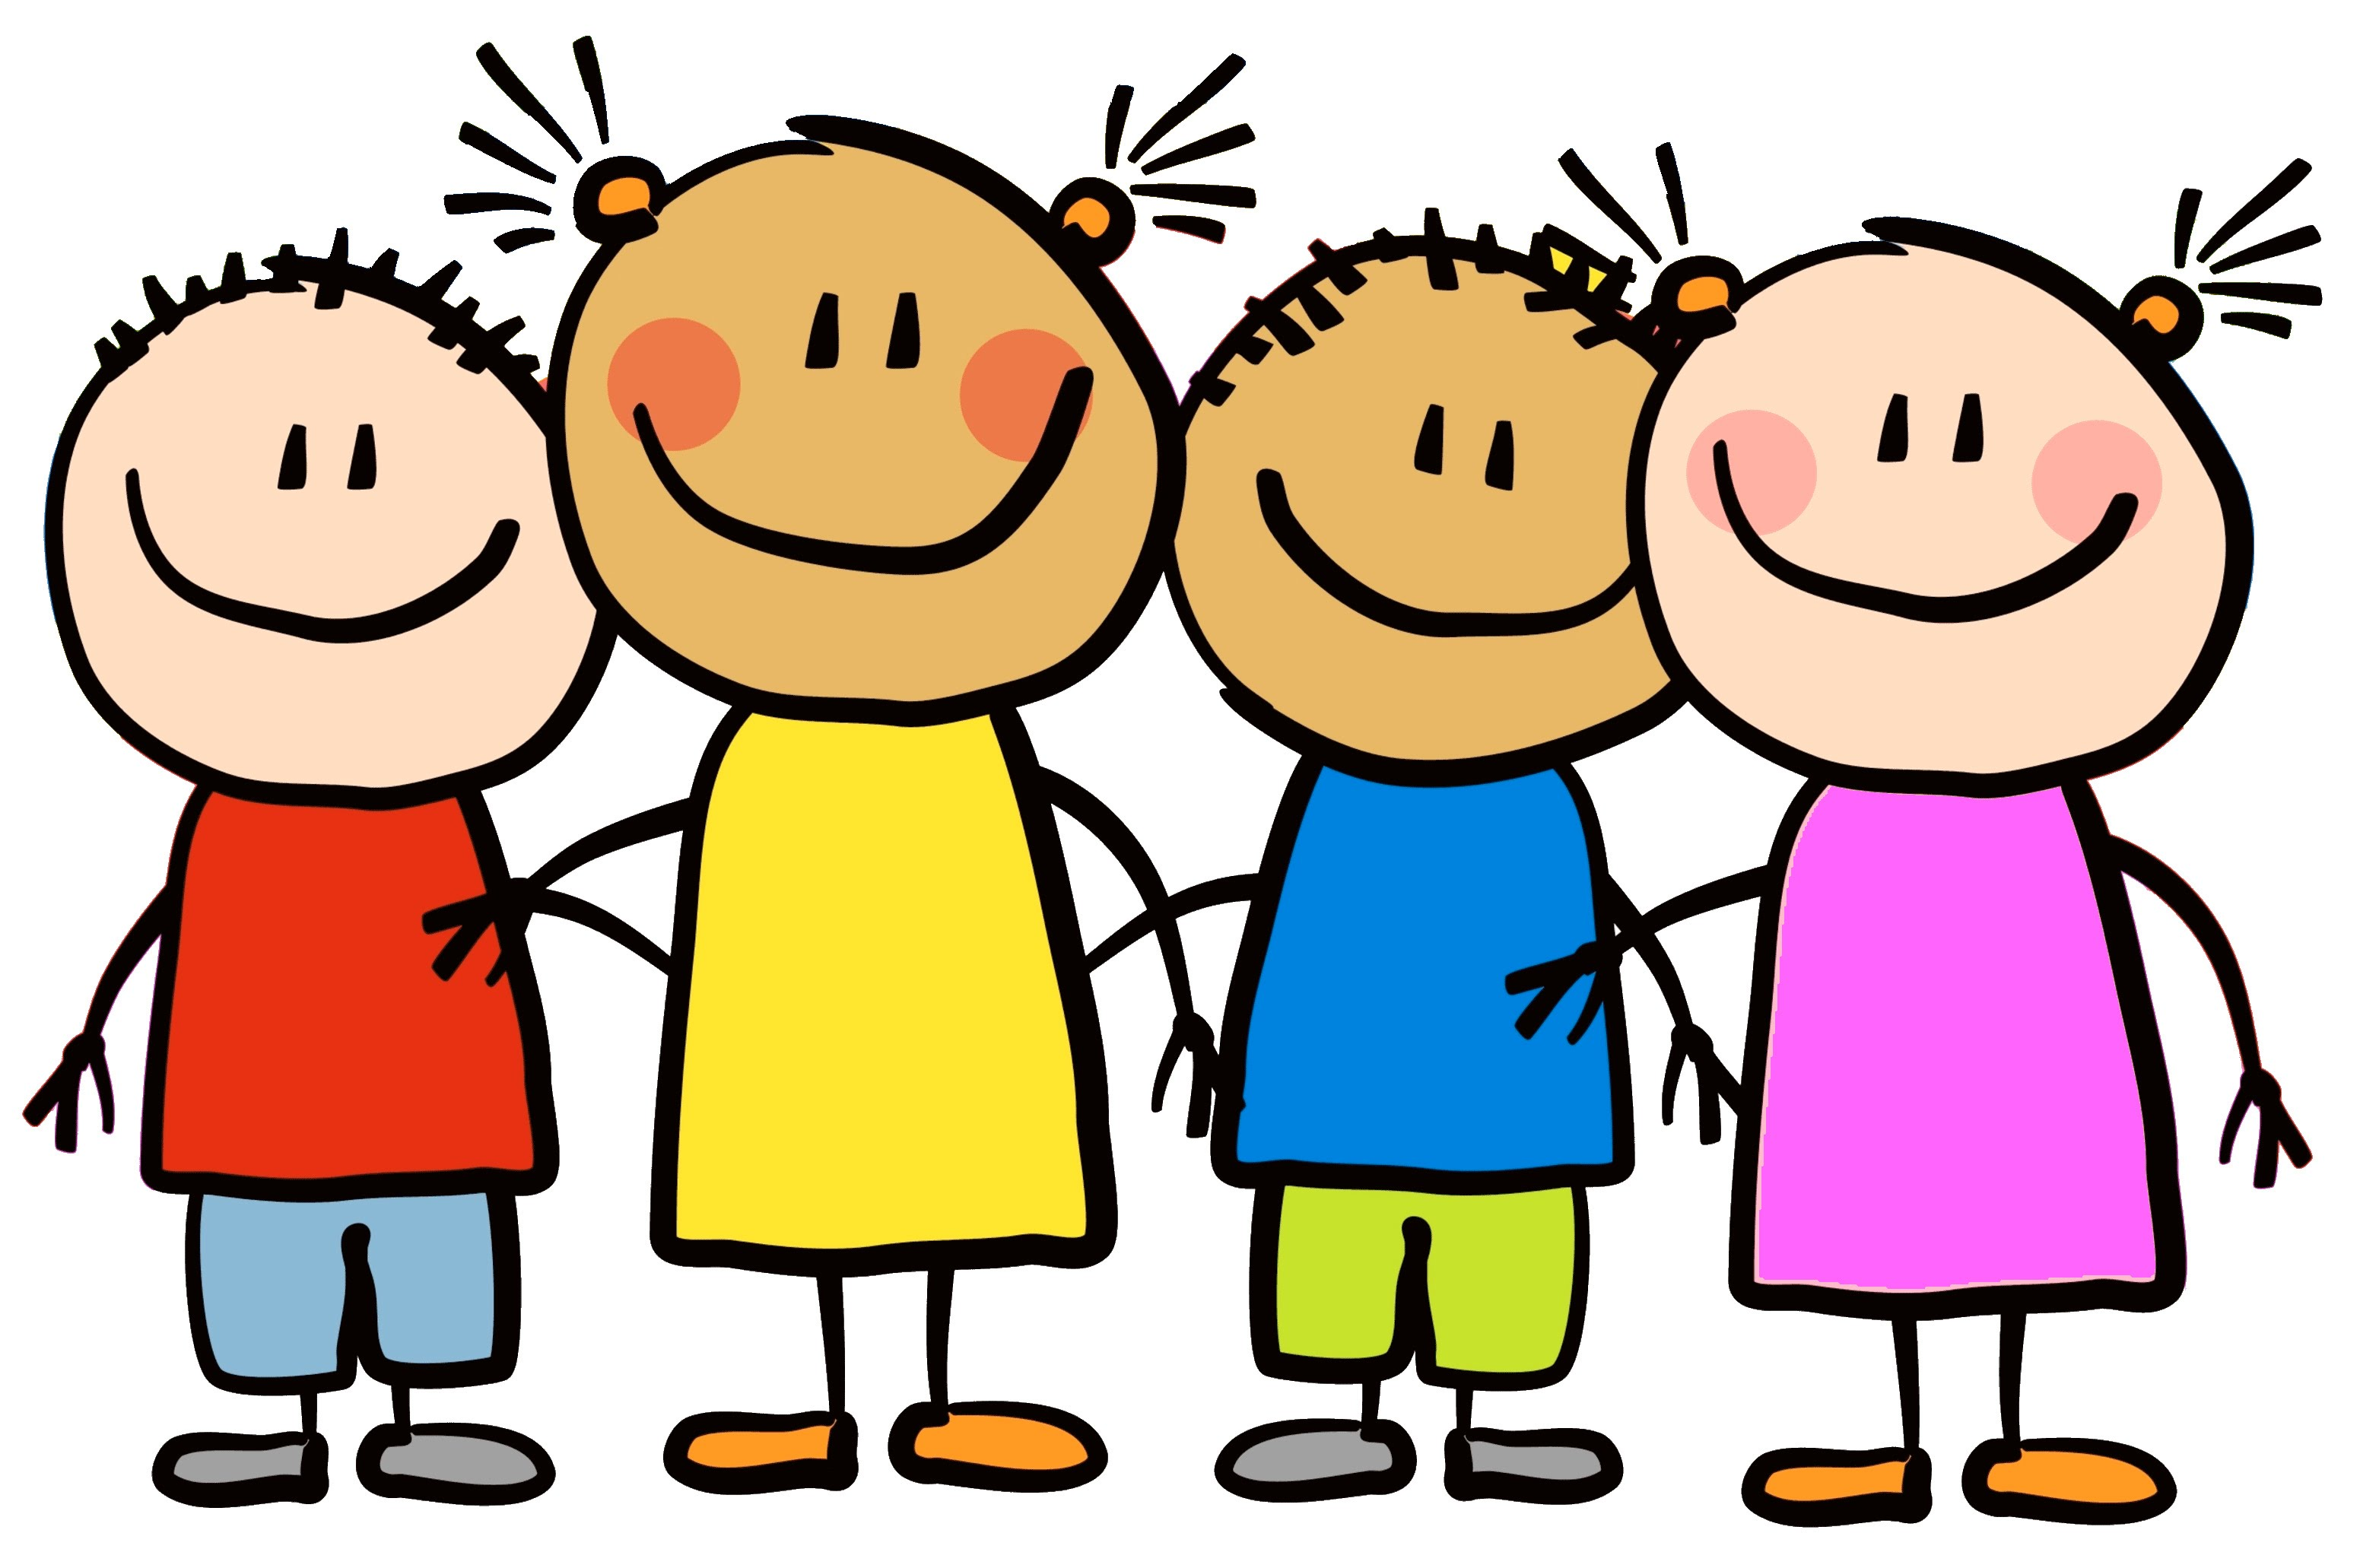 Happy kid at school clipart - ClipartFes-Happy kid at school clipart - ClipartFest-1